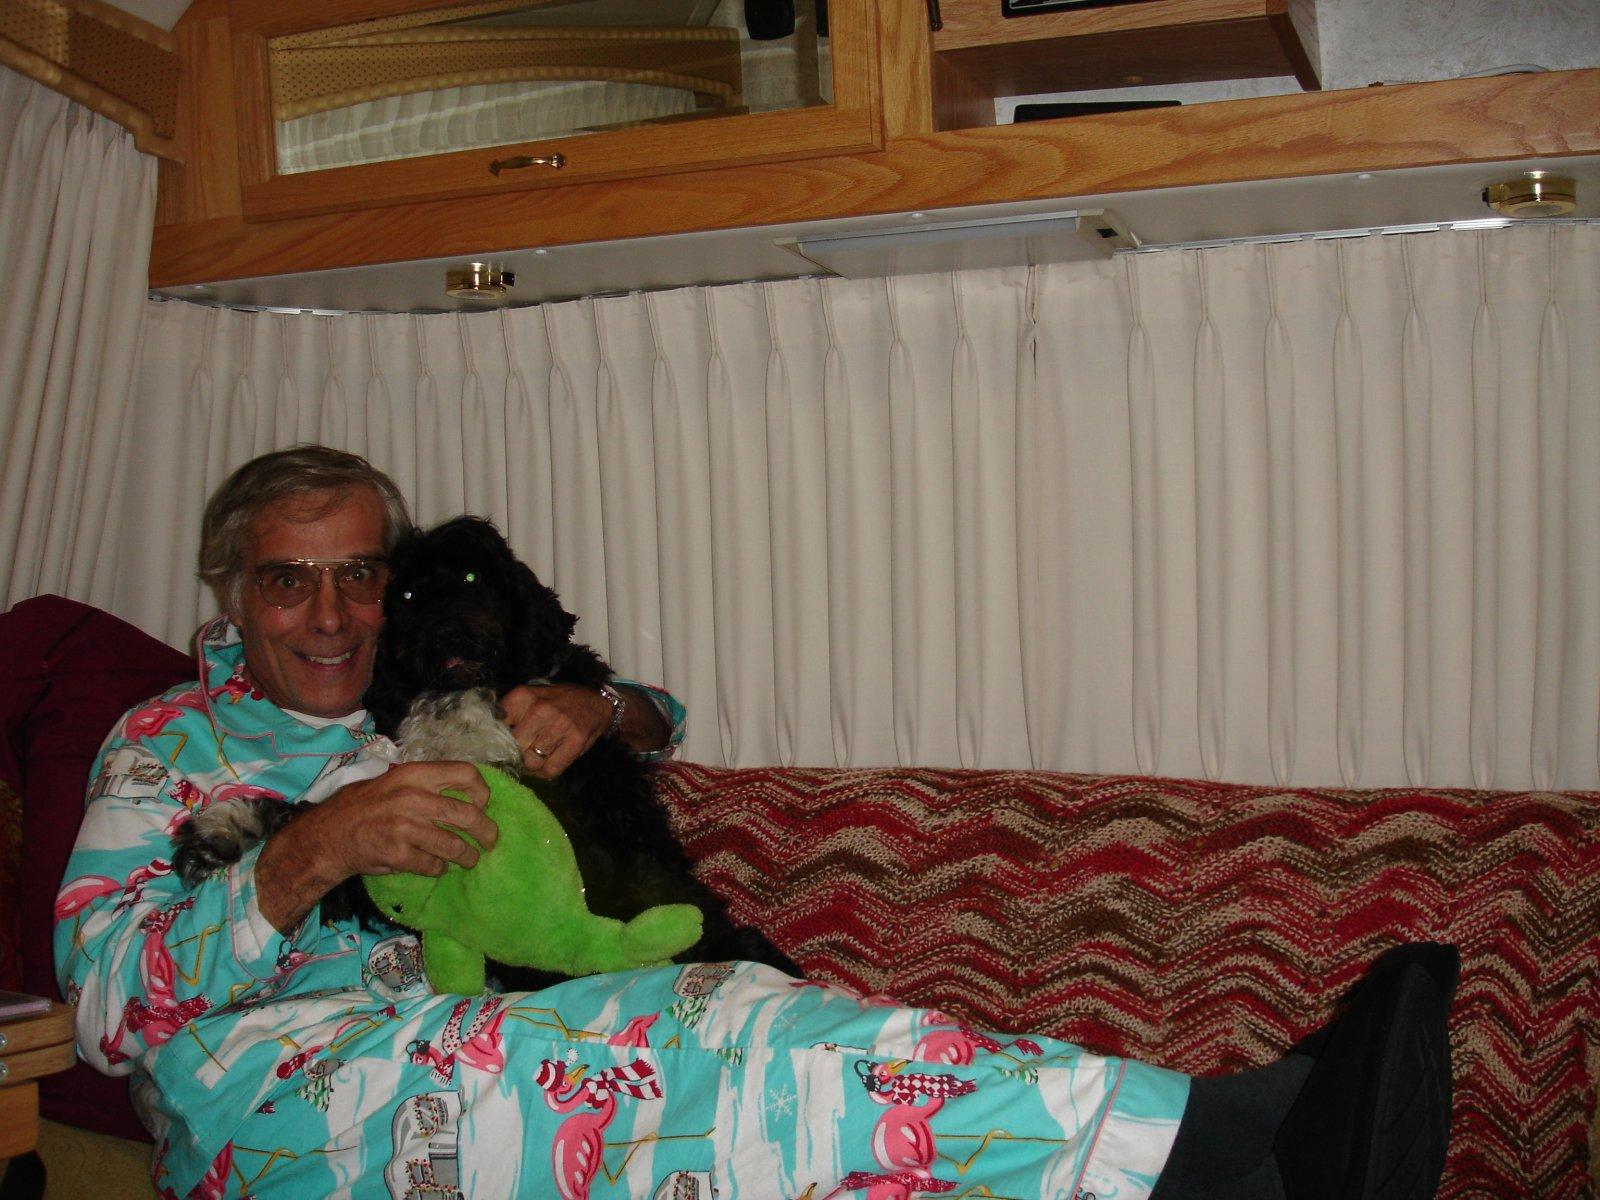 Click image for larger version  Name:Adirondack Leaf Peep'n October 2008 049.jpg Views:99 Size:305.0 KB ID:74857